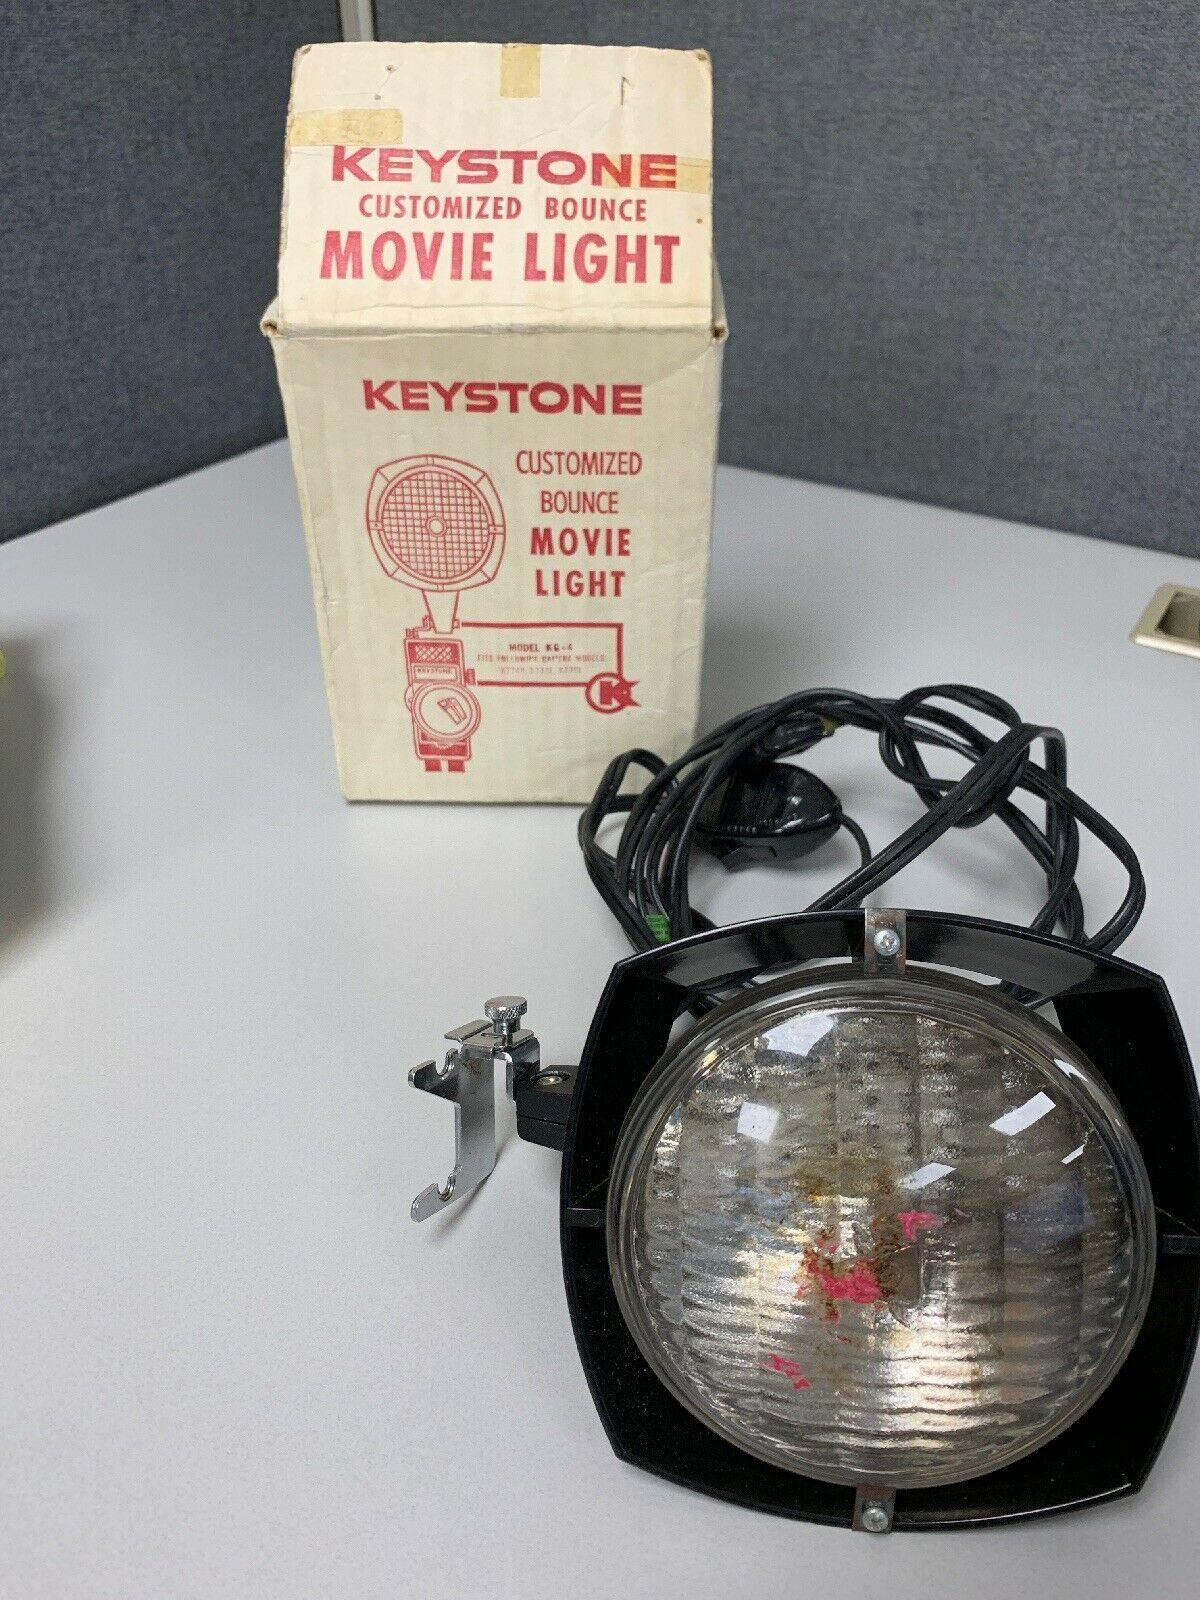 Vintage Keystone Customized Bounce Movie Light - original box model # KG-4 - $13.00